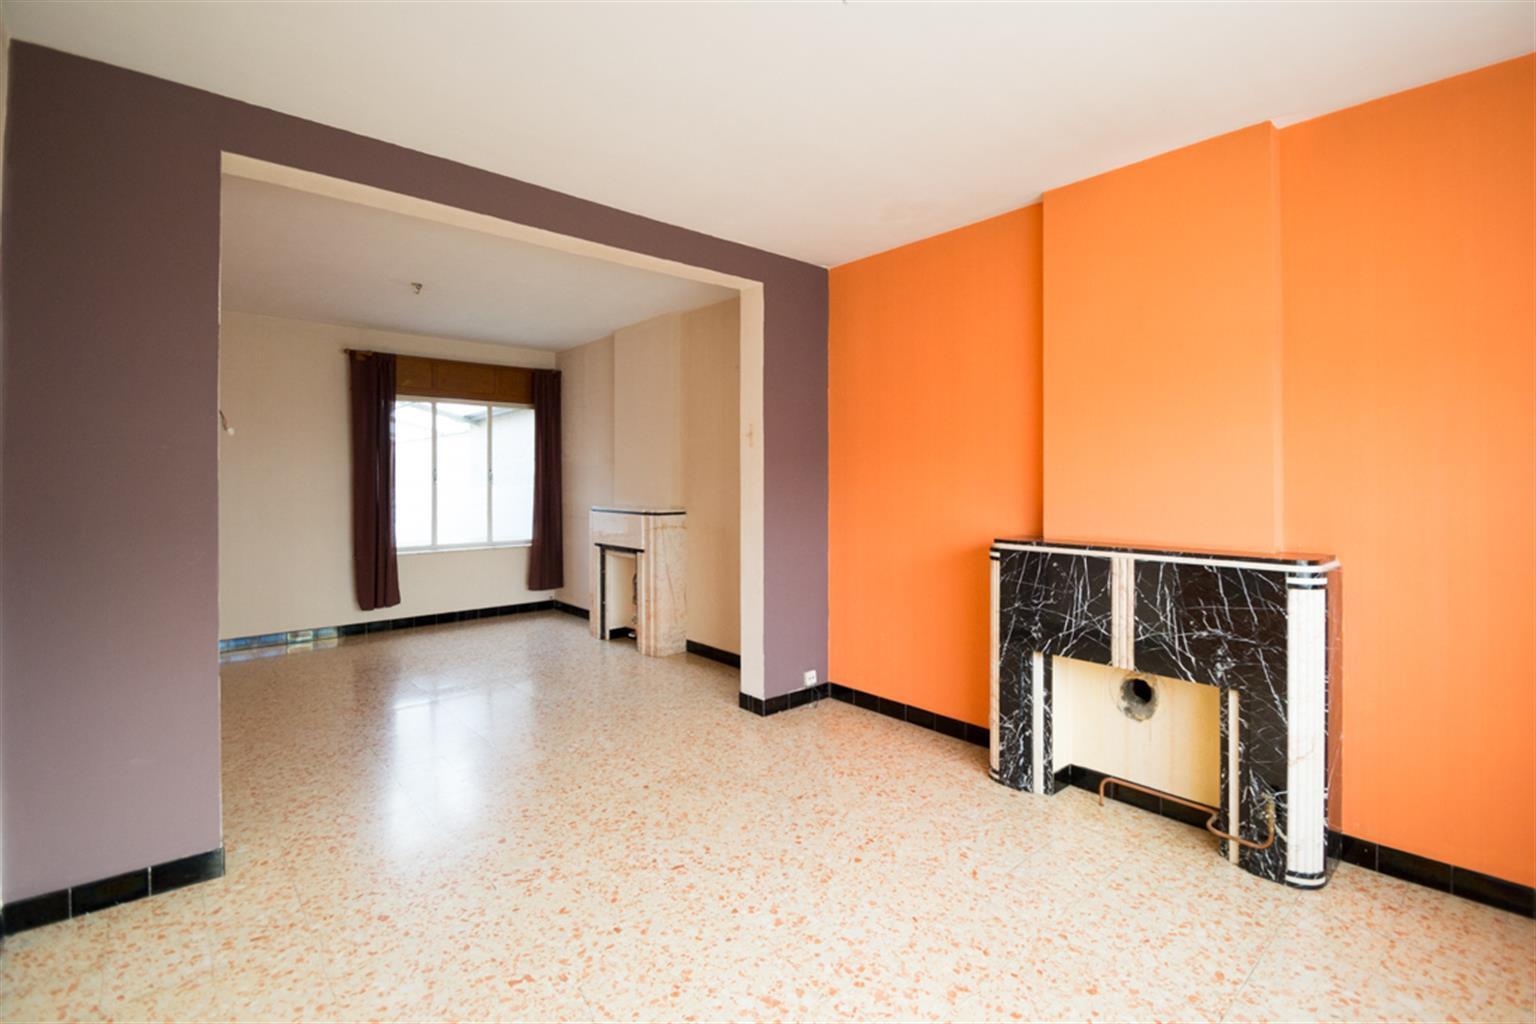 Maison - Houdeng-Aimeries - #4295574-2